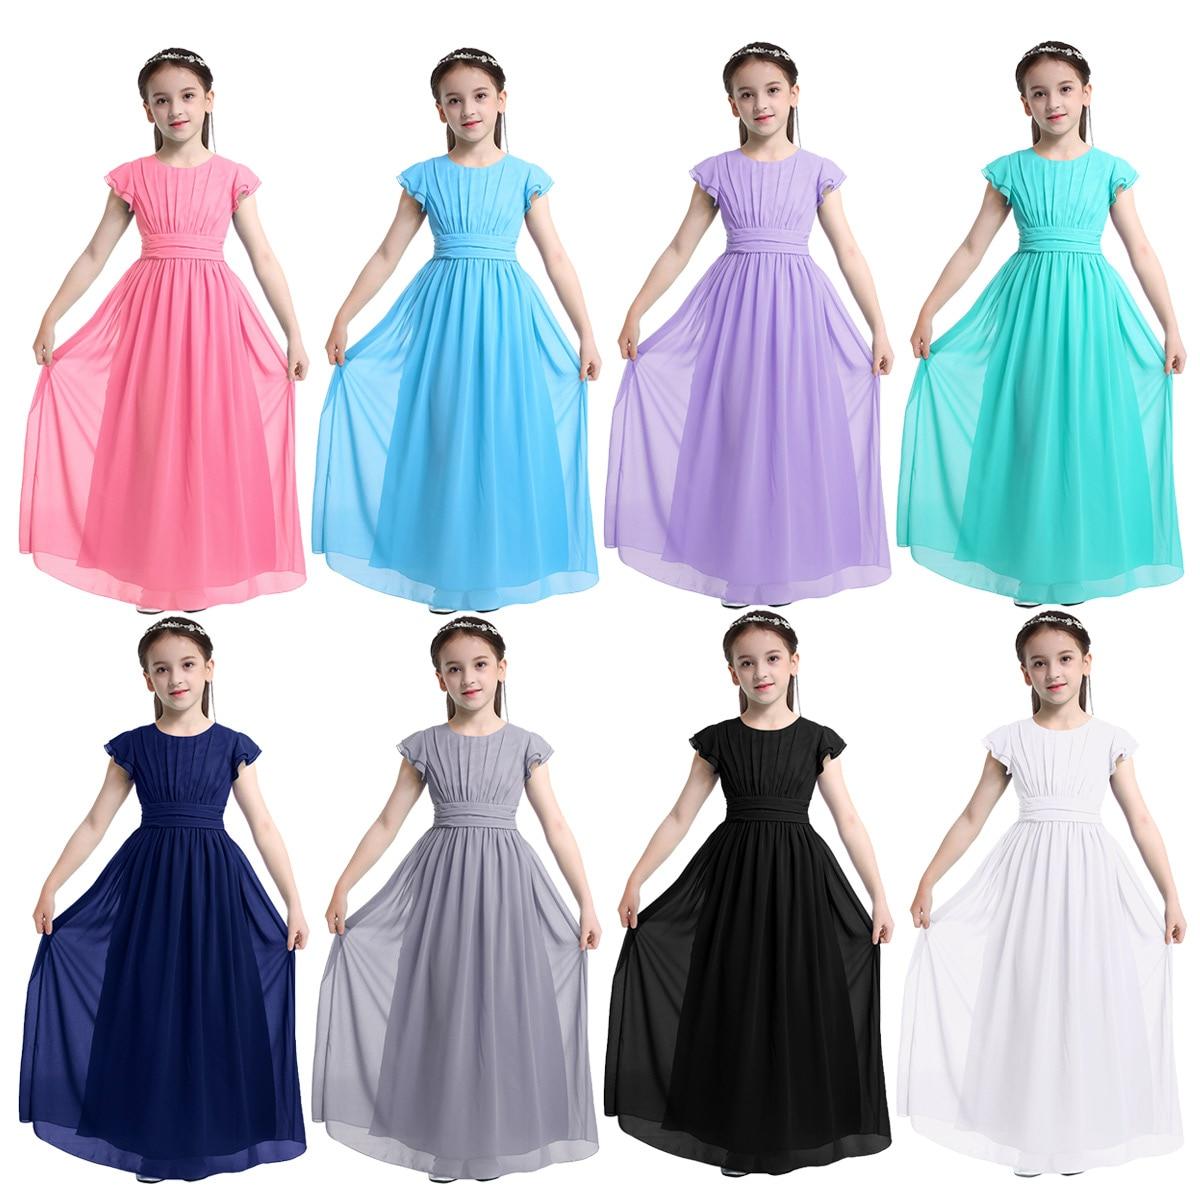 Image 2 - Girls Chiffon Flutter Sleeves Flower Girl Dress Pleated High waisted Princess Pageant Birthday Wedding Party Long Dress SZ 4 14Flower Girl Dresses   -